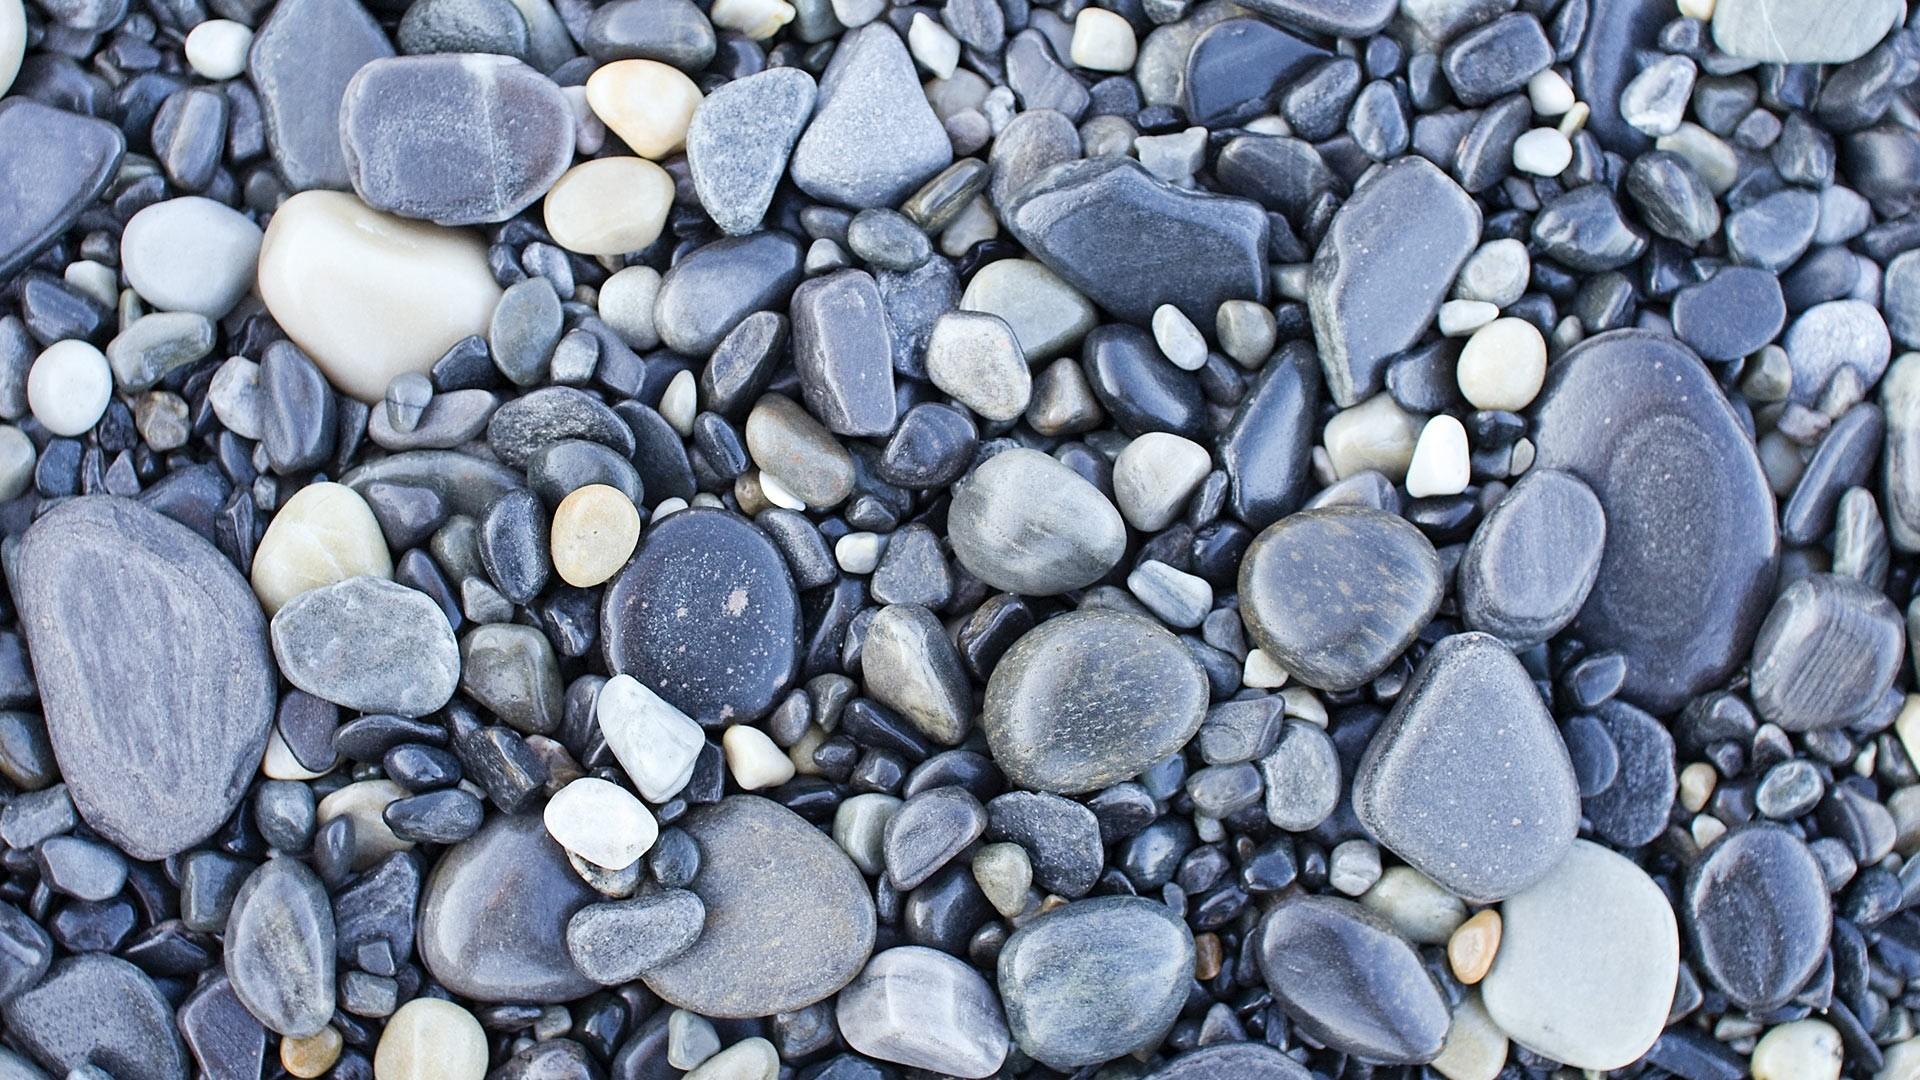 Stones desktop wallpaper hd